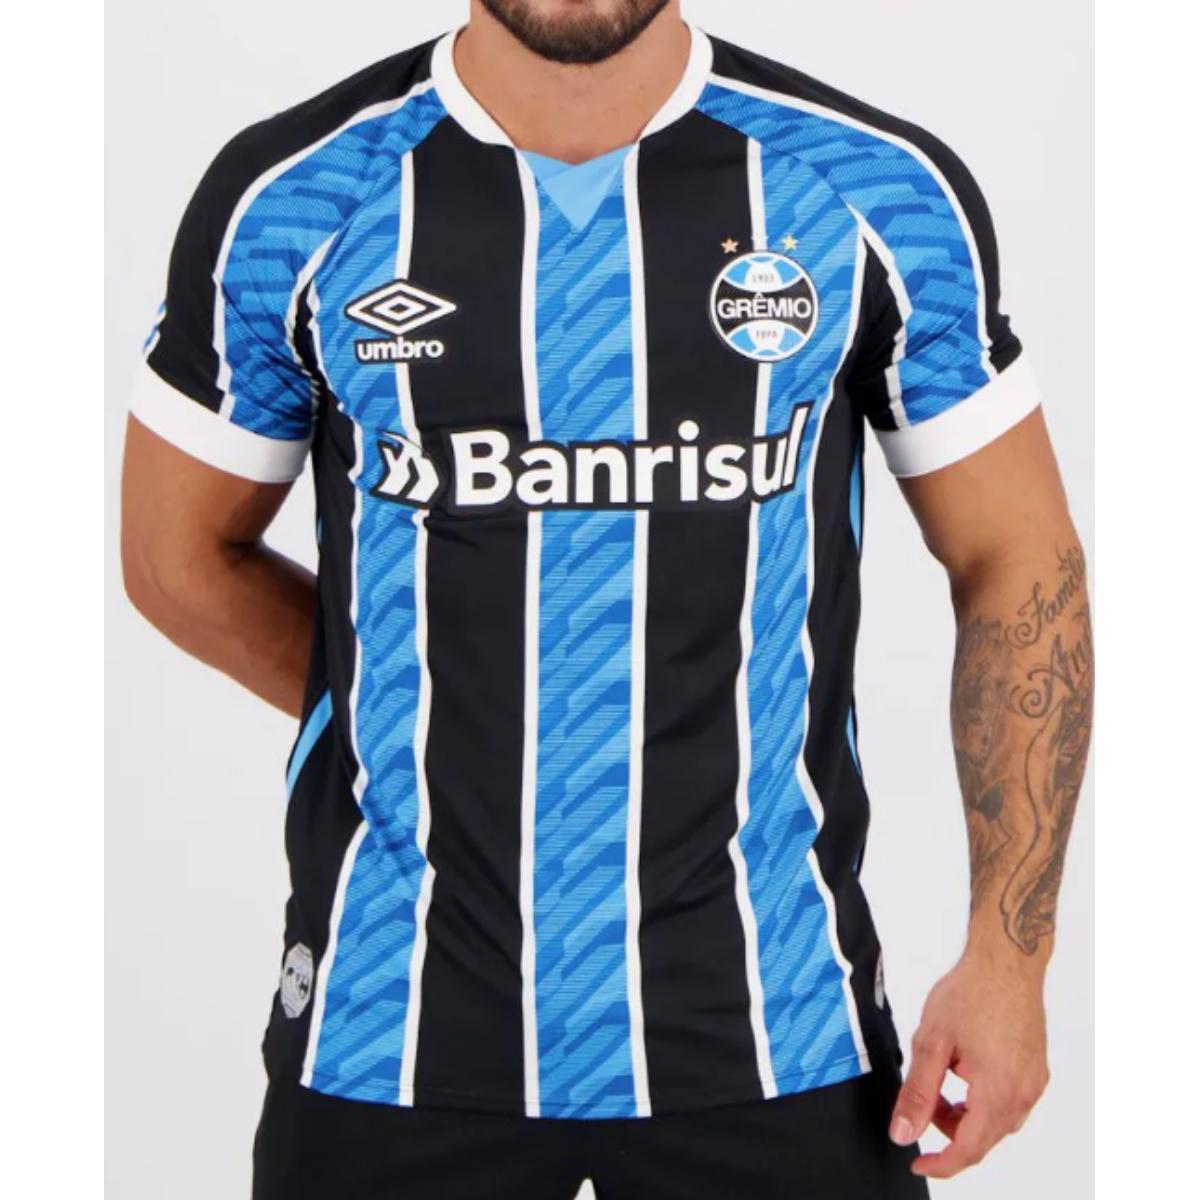 Camiseta Masculina Grêmio 3g161165 of i 2020 Classic c/ N10 Tricolor